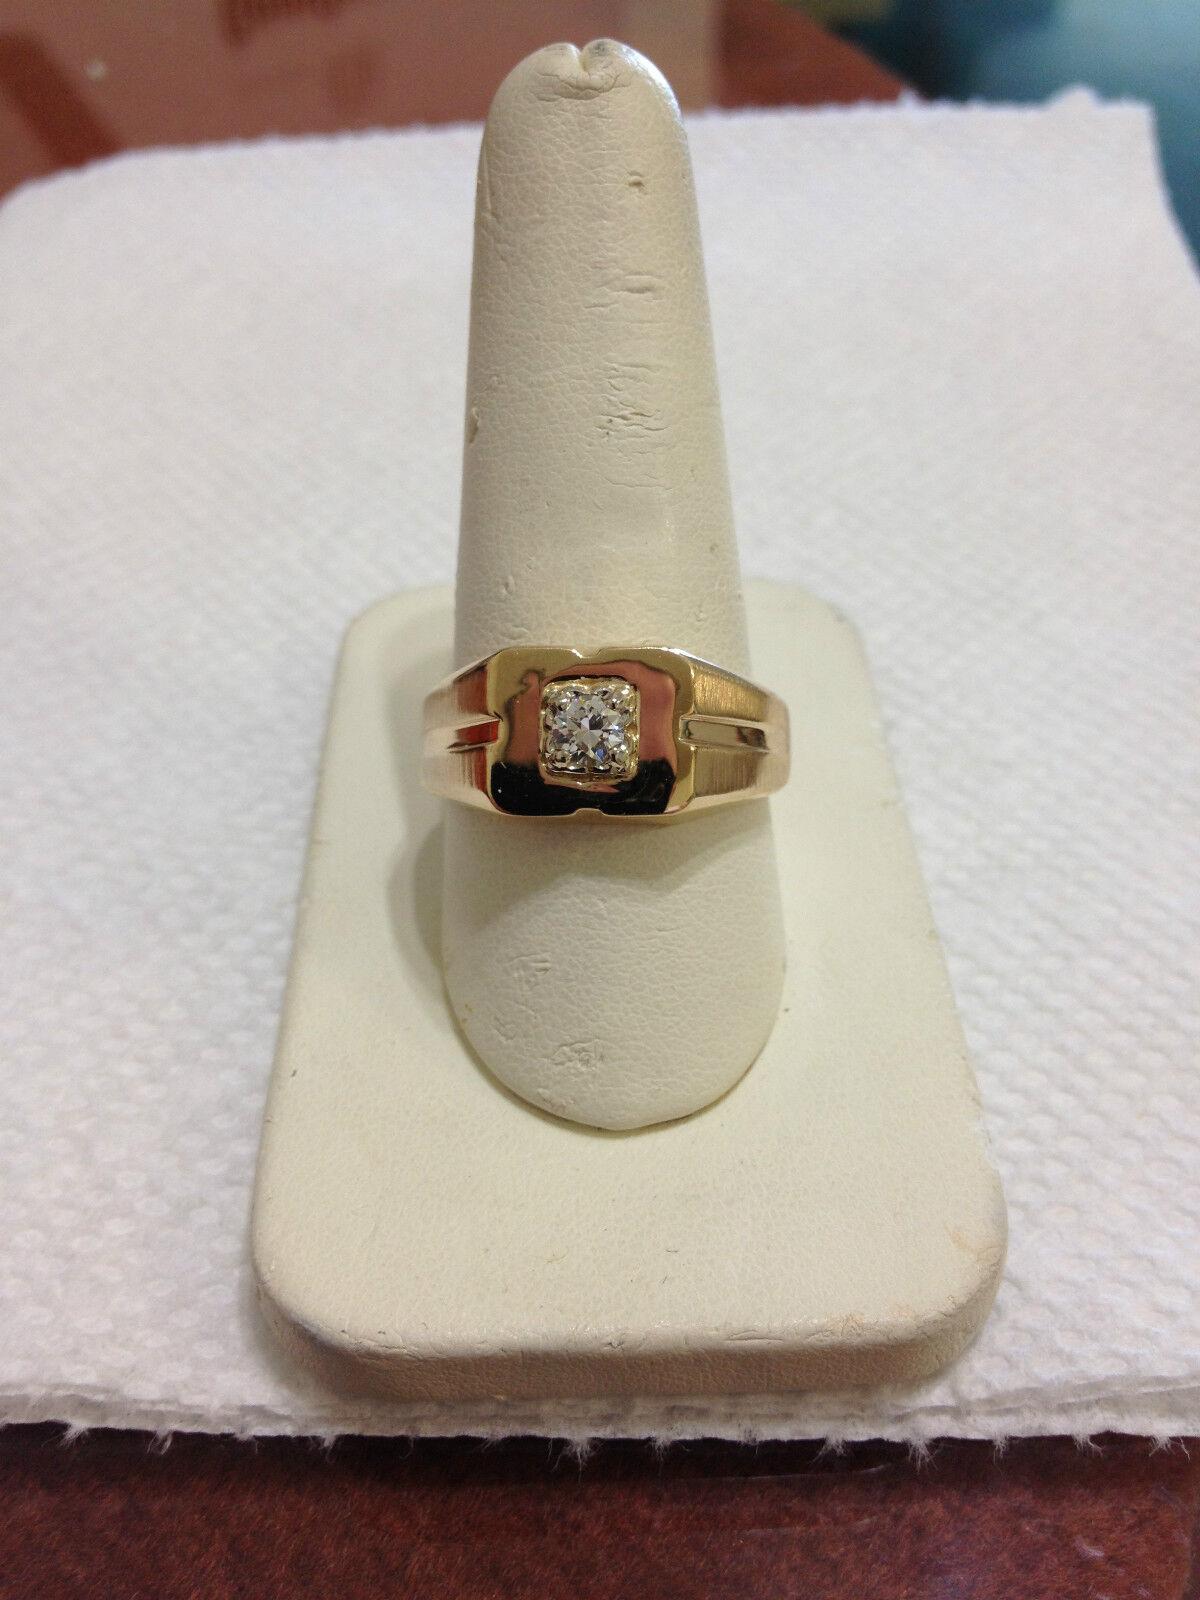 MENS LADIES DIAMOND SOLITAIRE PINKIE RING NO RESERVE